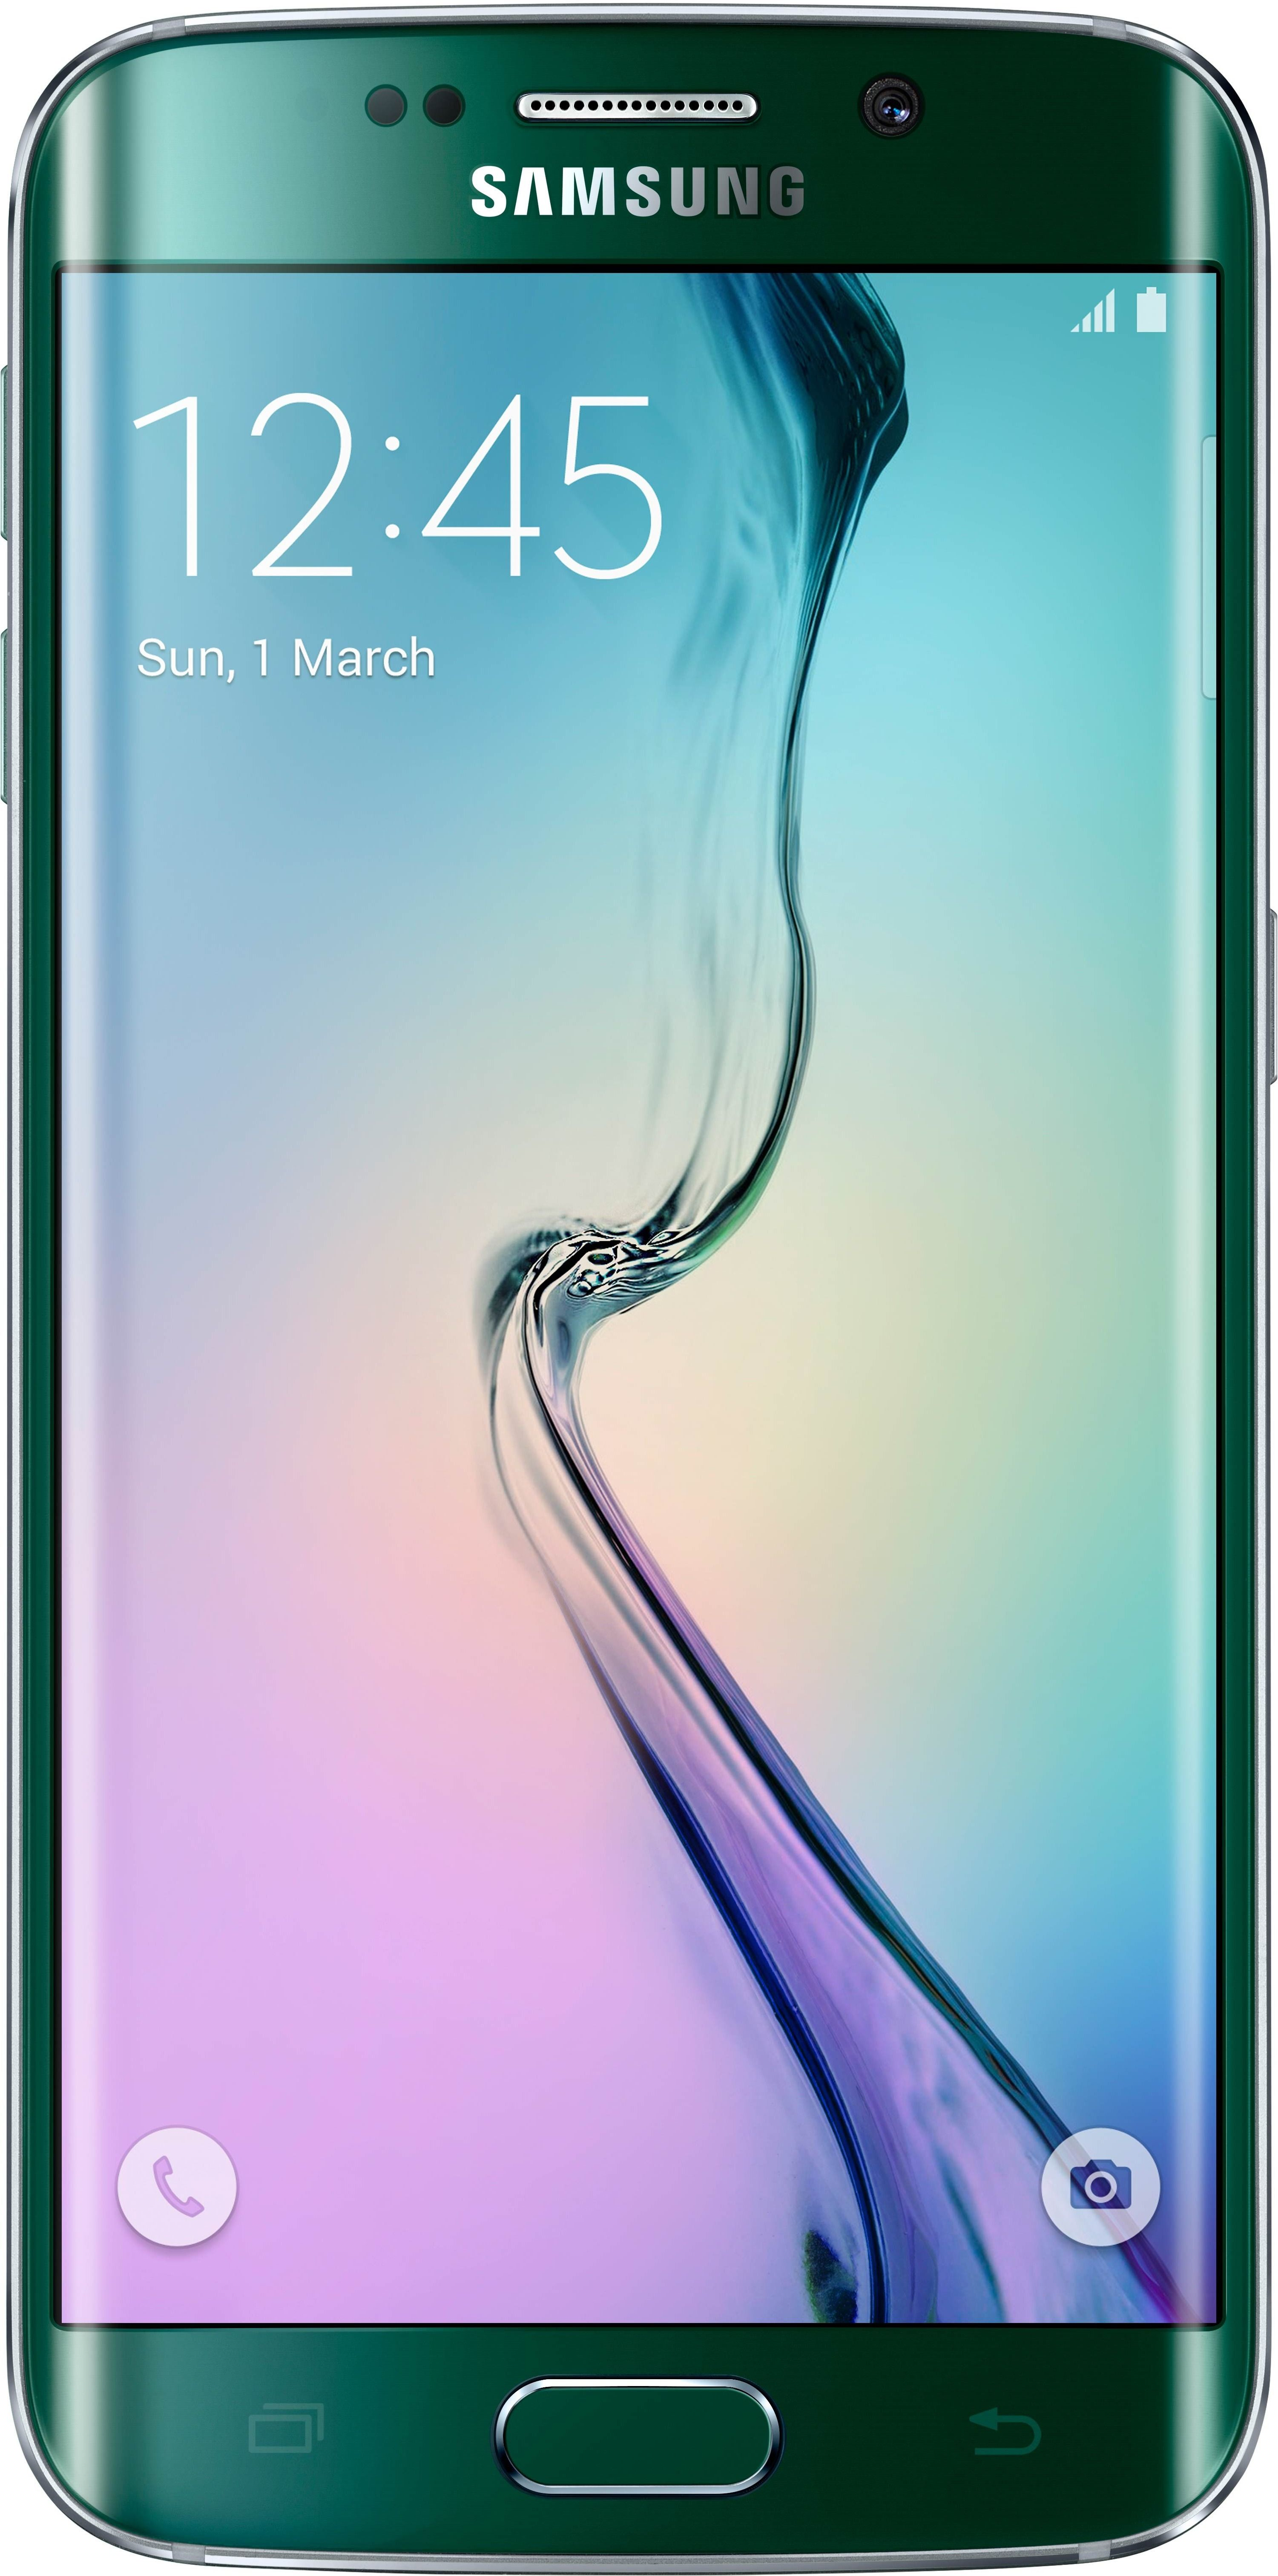 Nye Samsung Galaxy S6 Edge har støtte for 4G+. Foto: Samsung